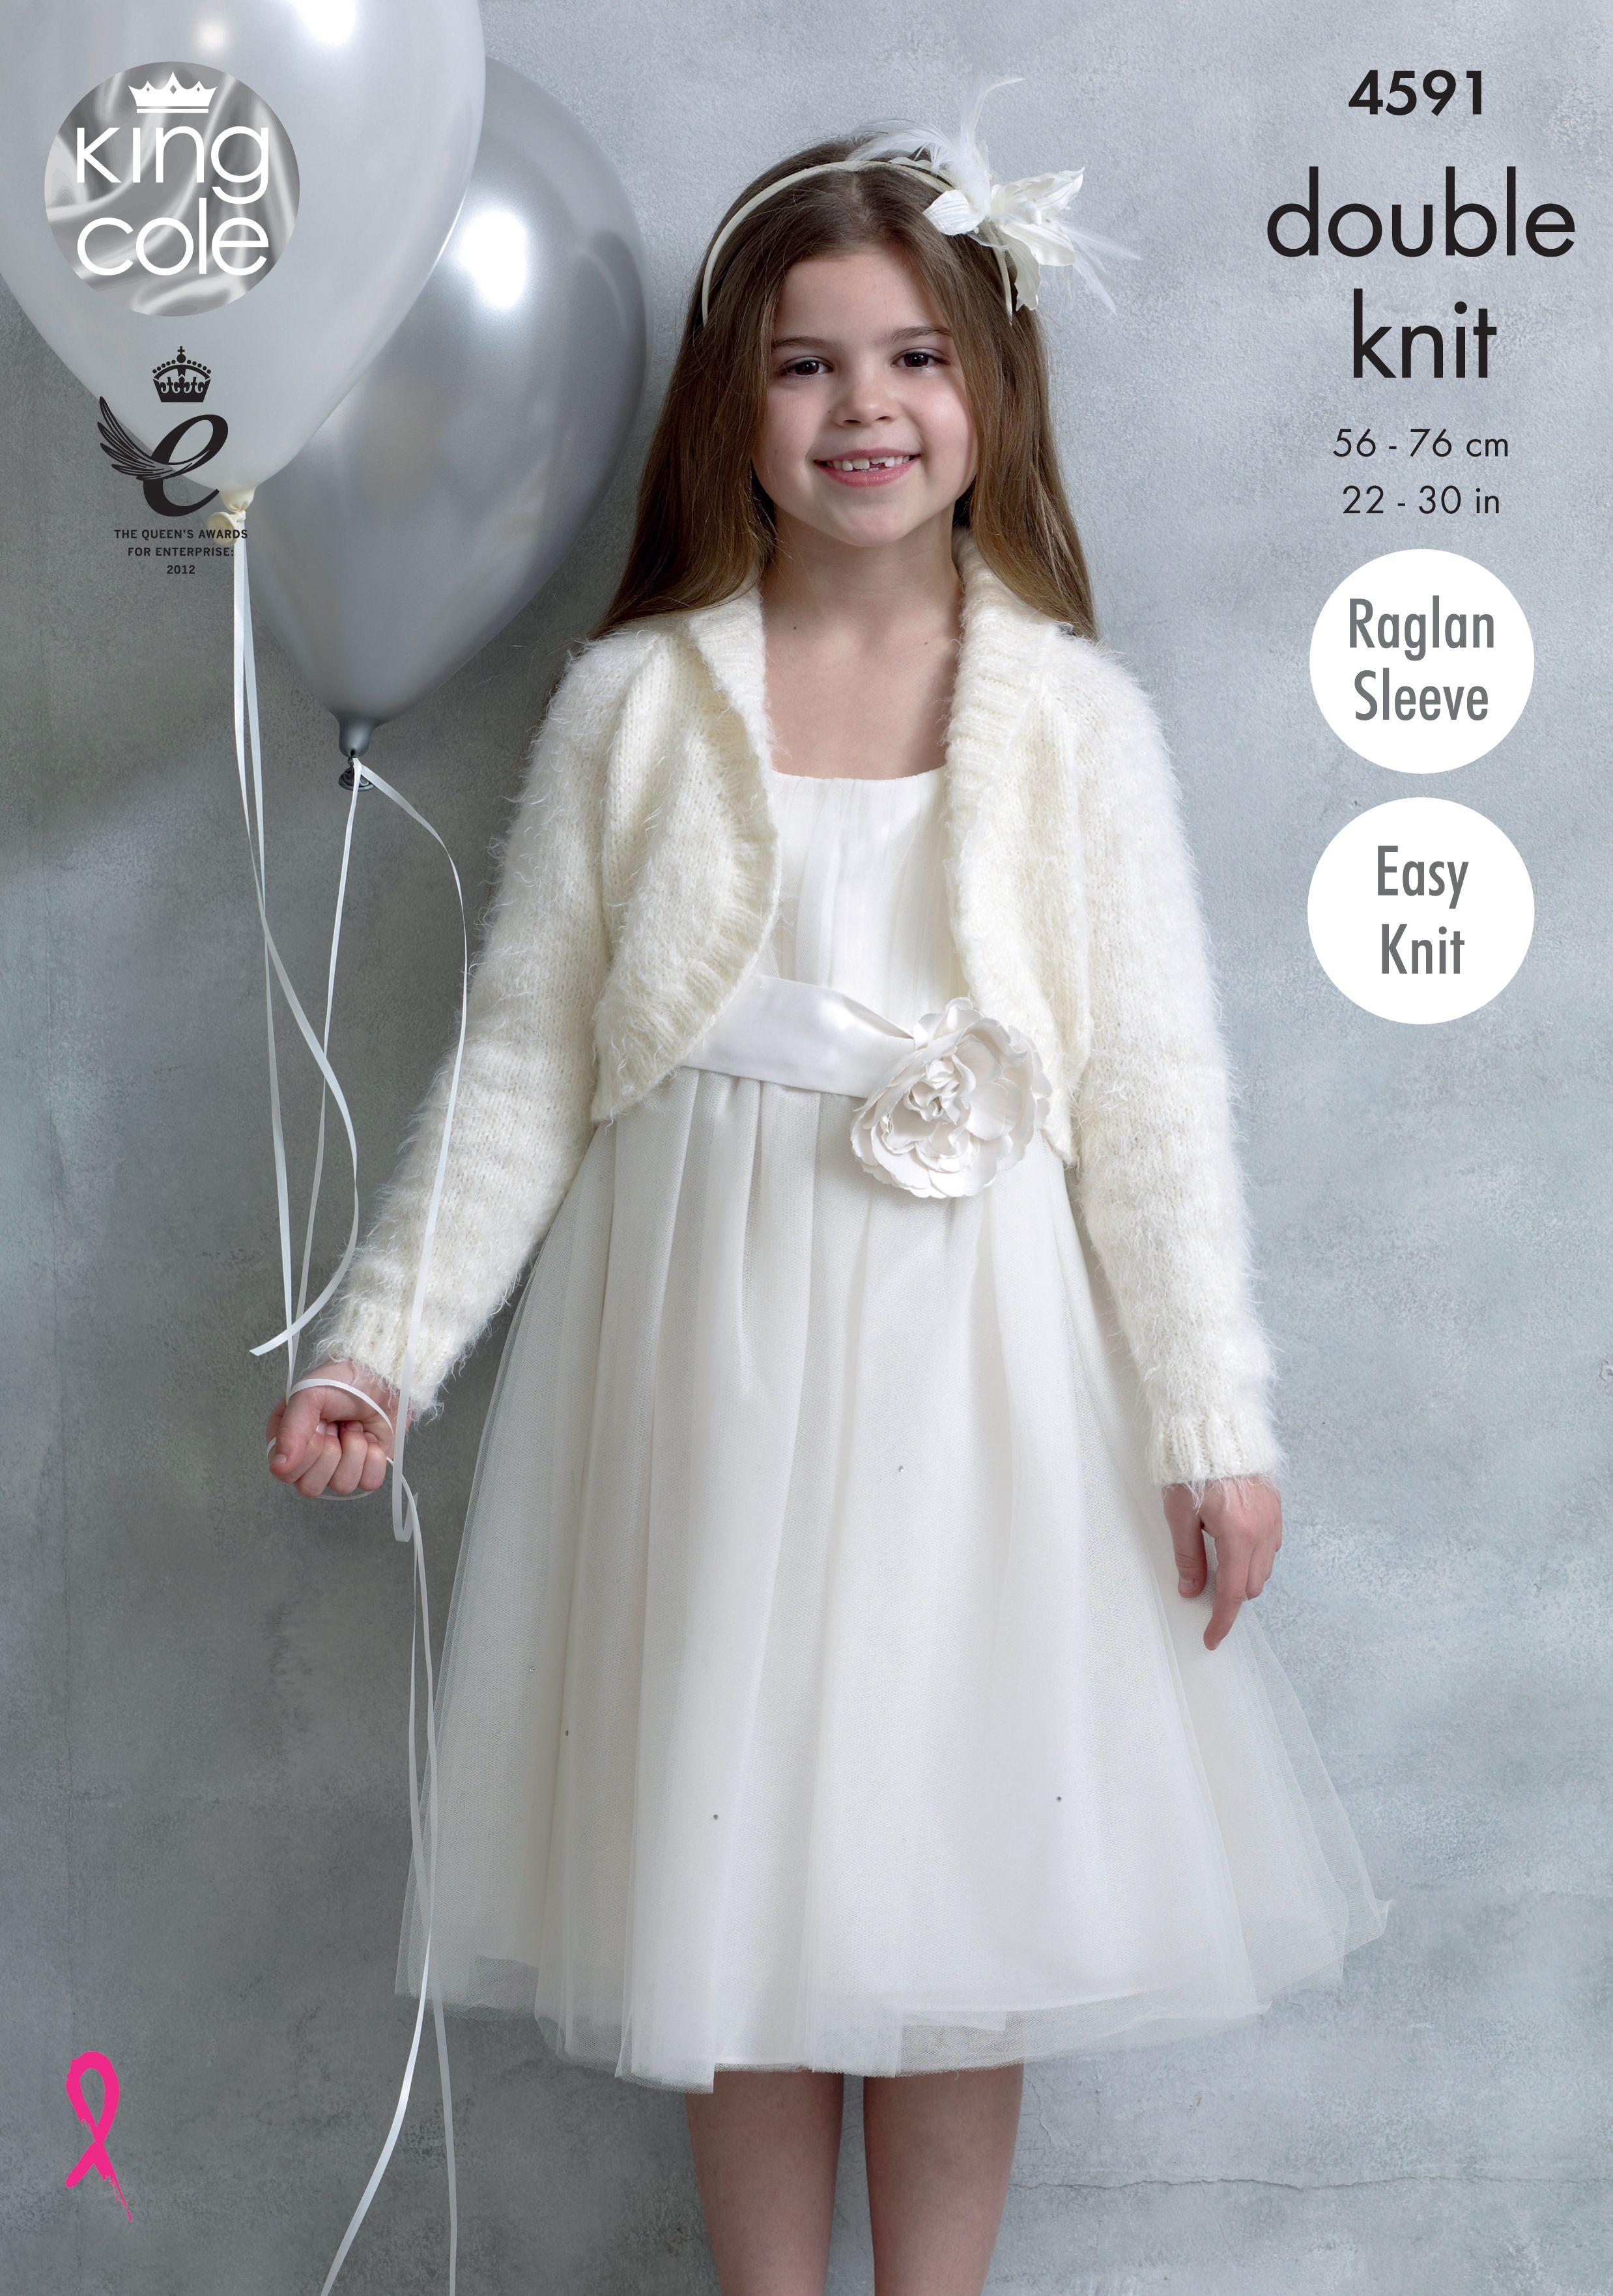 Childrens Knitted Boleros - King Cole   Embrace   Pinterest ...